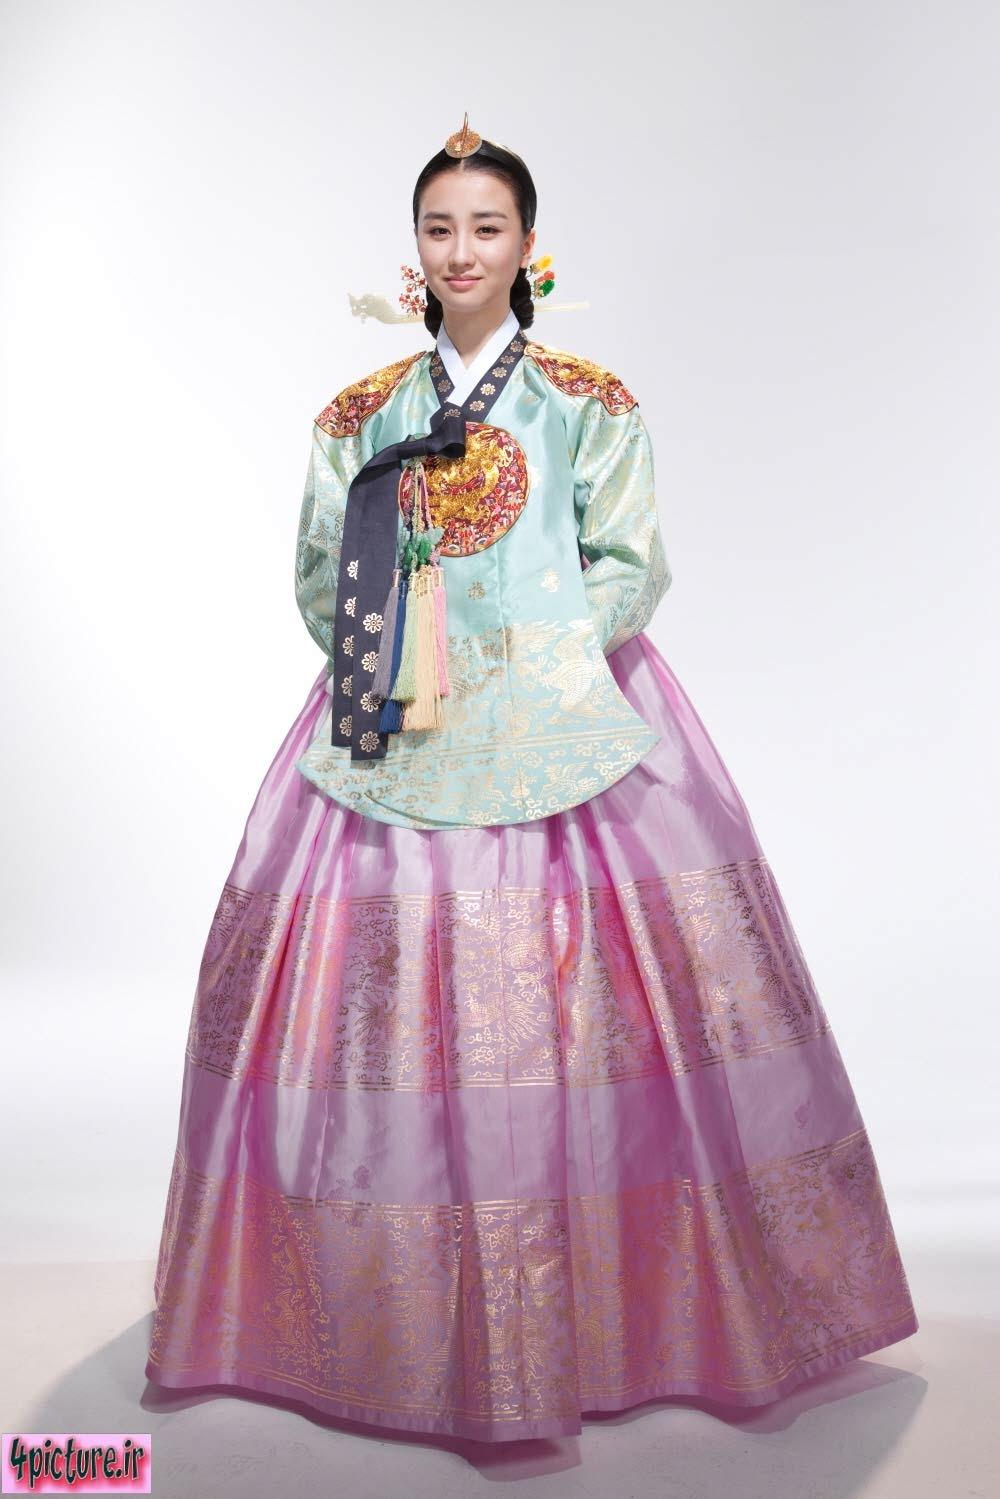 Park Ha-Sun,Wang Hu In Hyeon,اين هيون,عکس بانو این هیون,ملکه این هیون